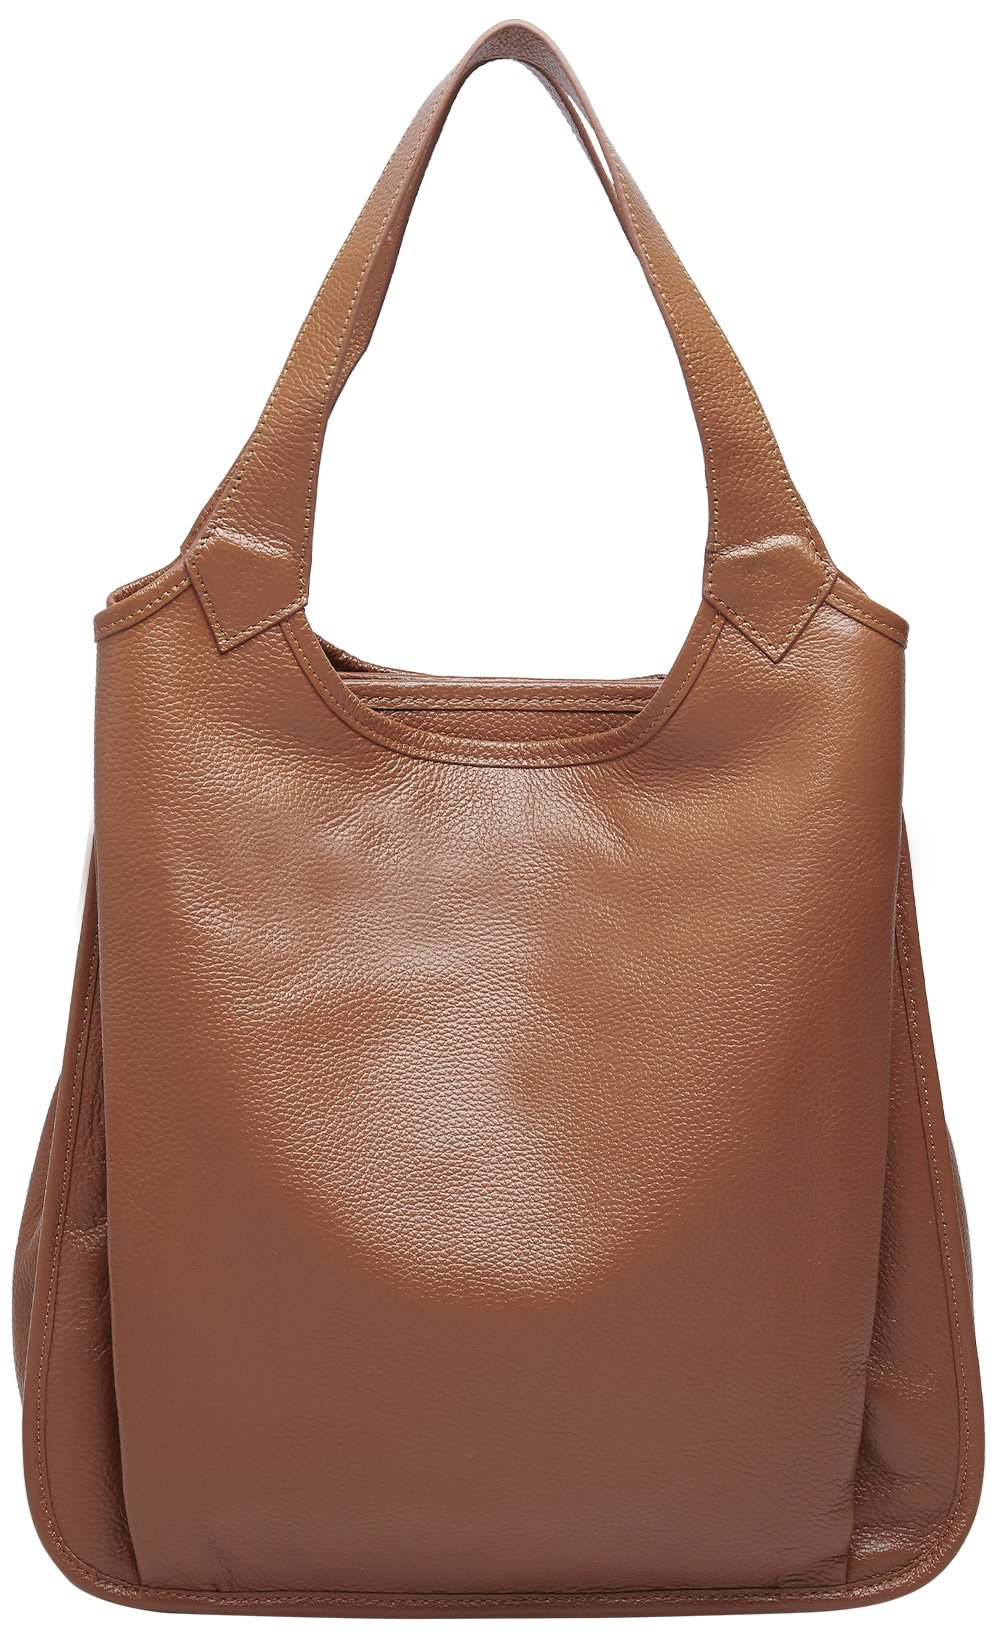 BOYATU Womens Tote Real Leather Handbag for Ladies Large Capacity Shoulder Purse (Brown)